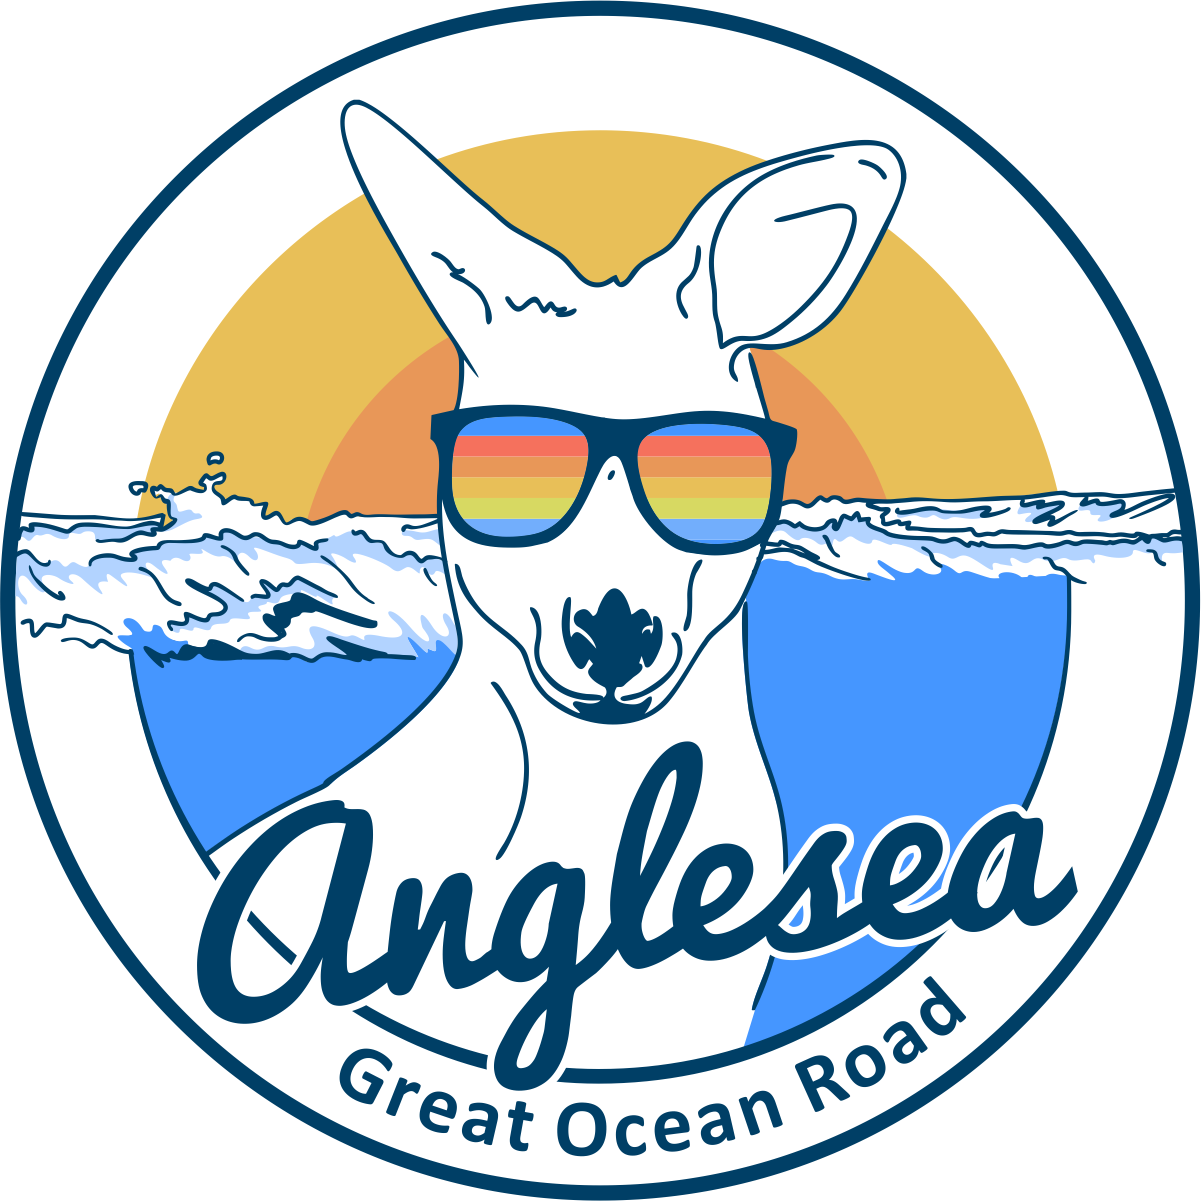 Design a 'surfer vibe' sticker for a beach town.